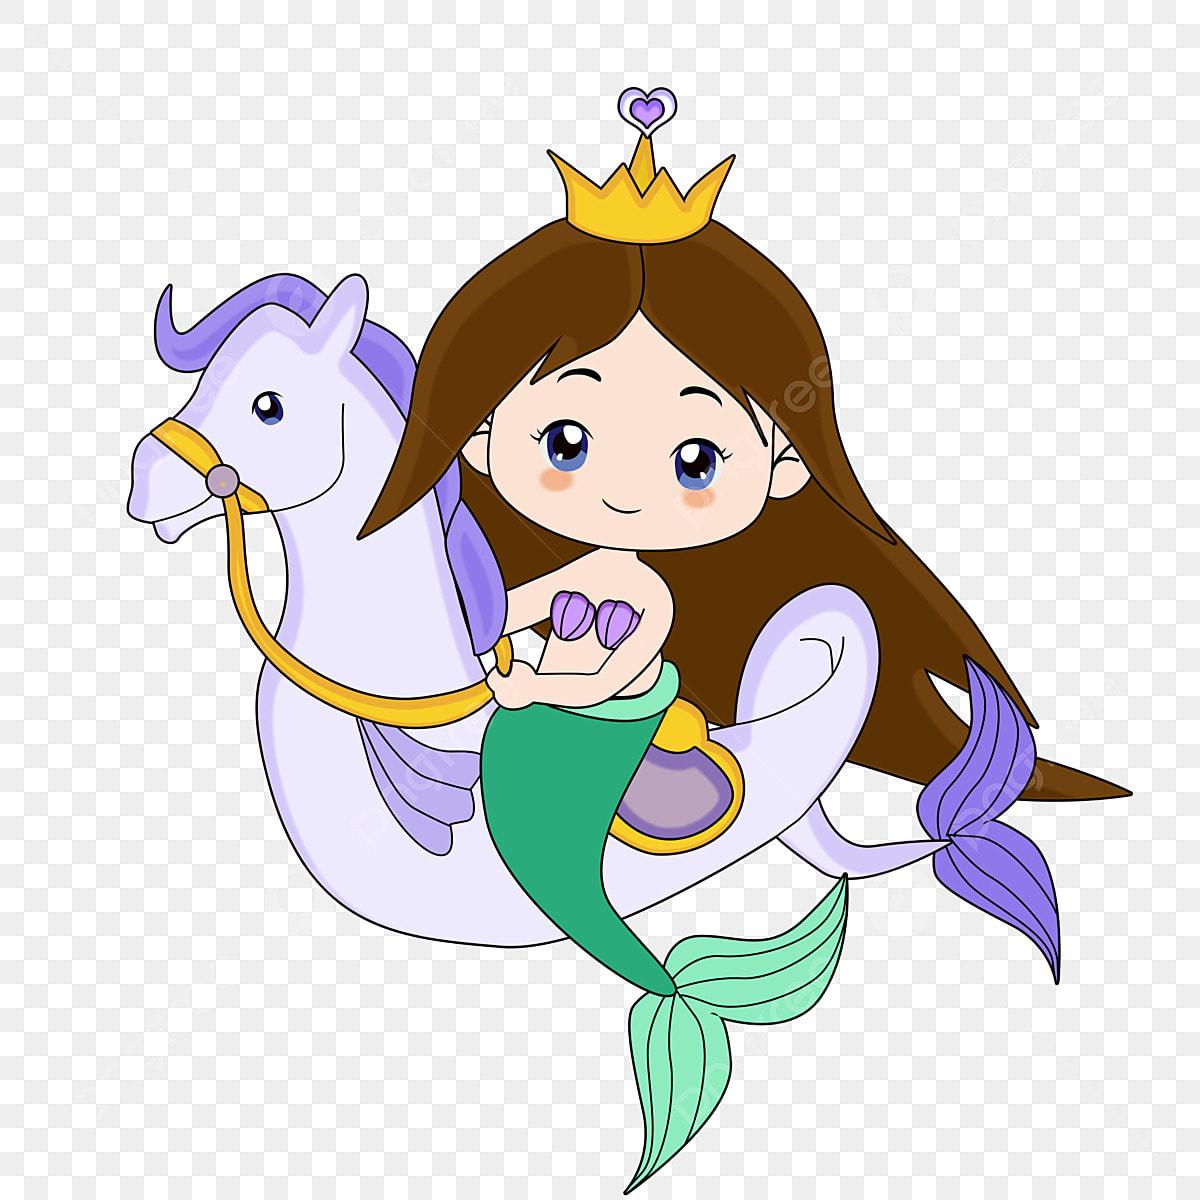 Princesa Sirena Sirena De Dibujos Animados Fantasia Criatura